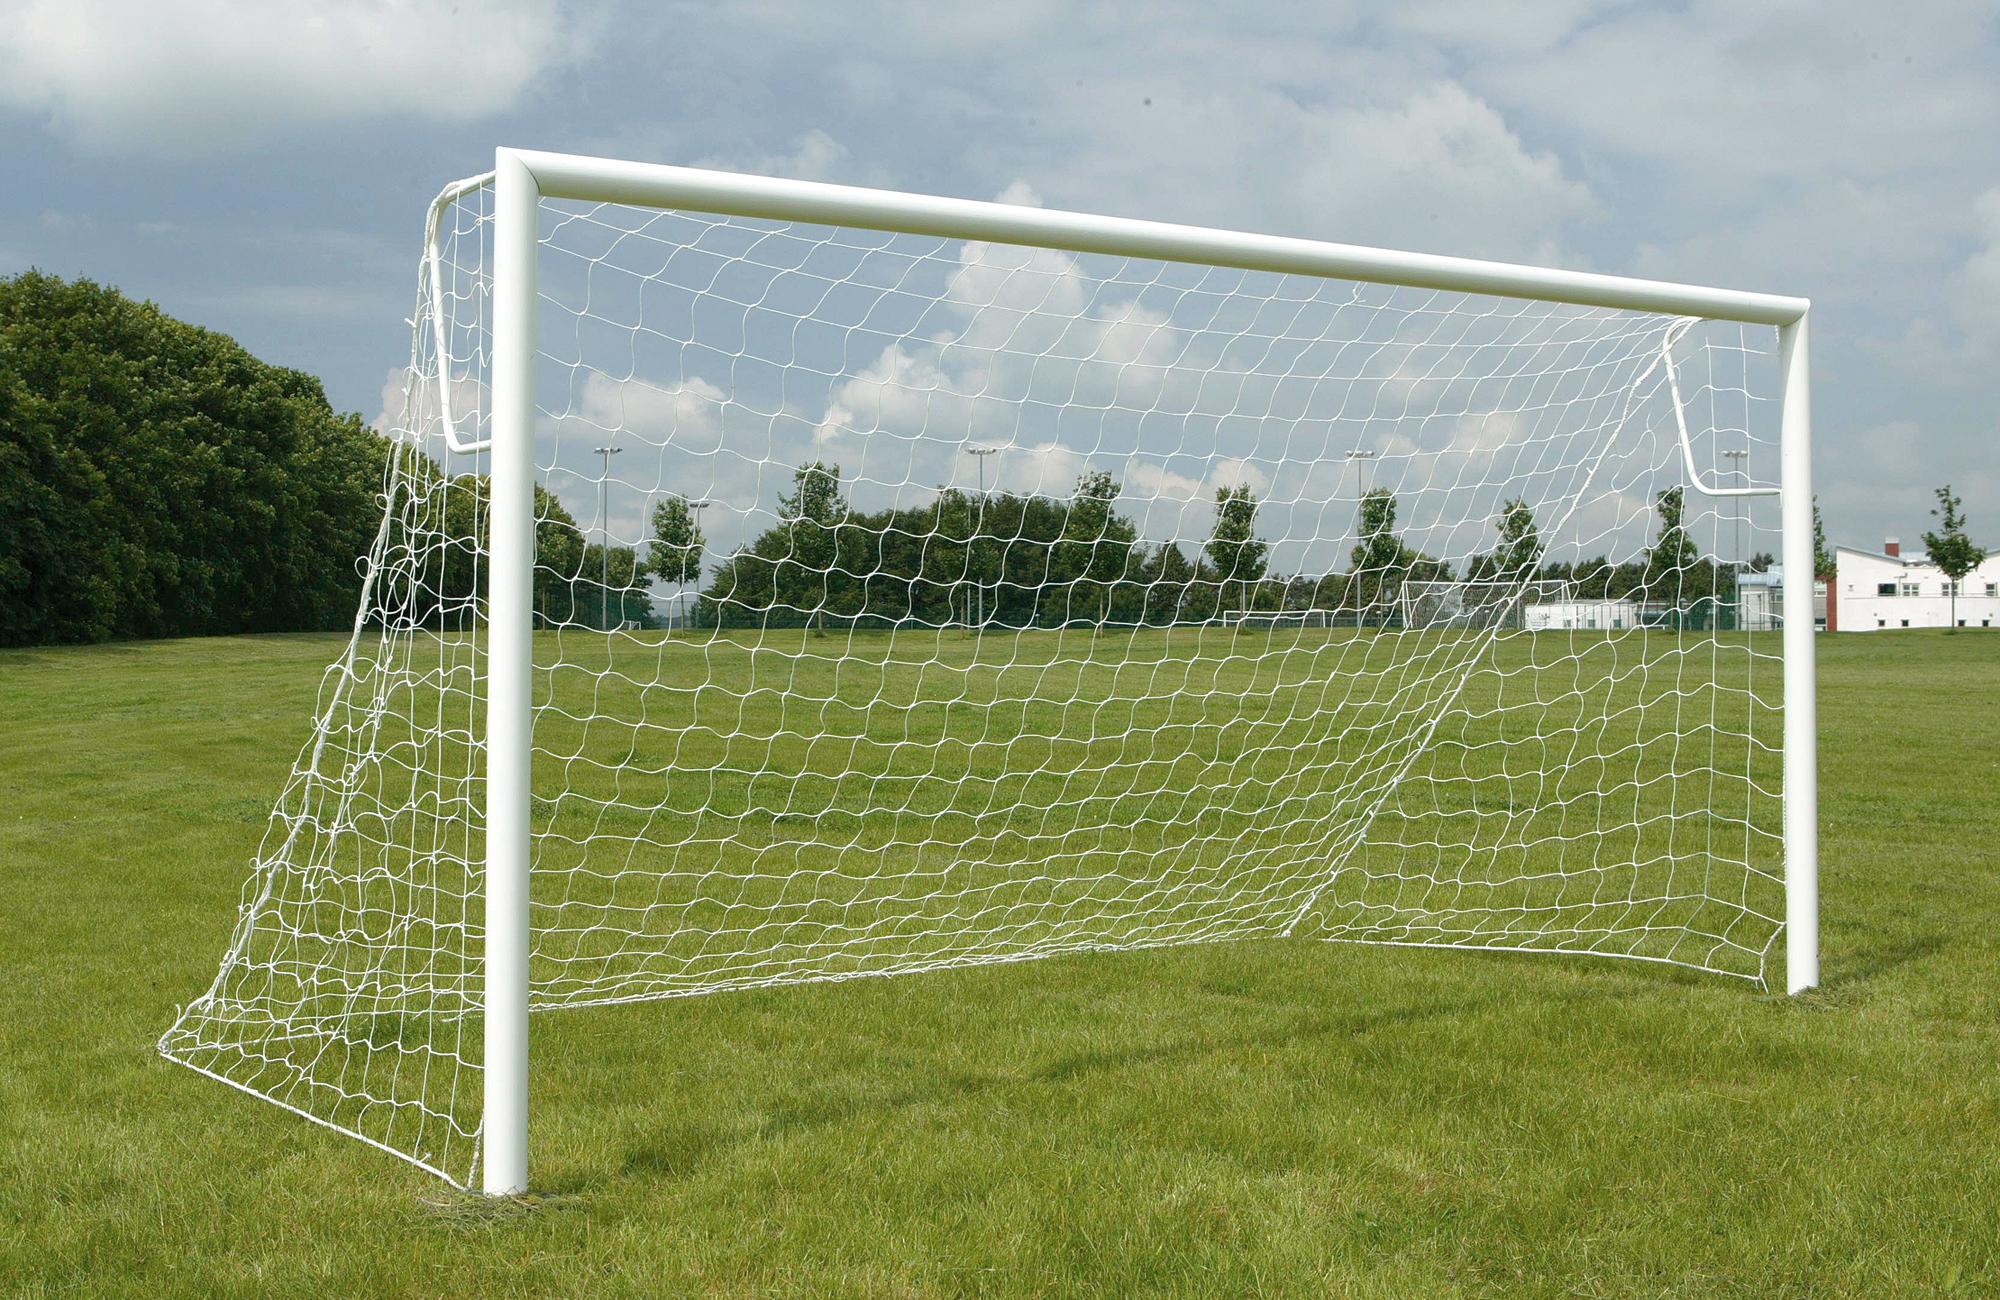 80mm Aluminium Socketed Football Goal Posts - 12' x 6'